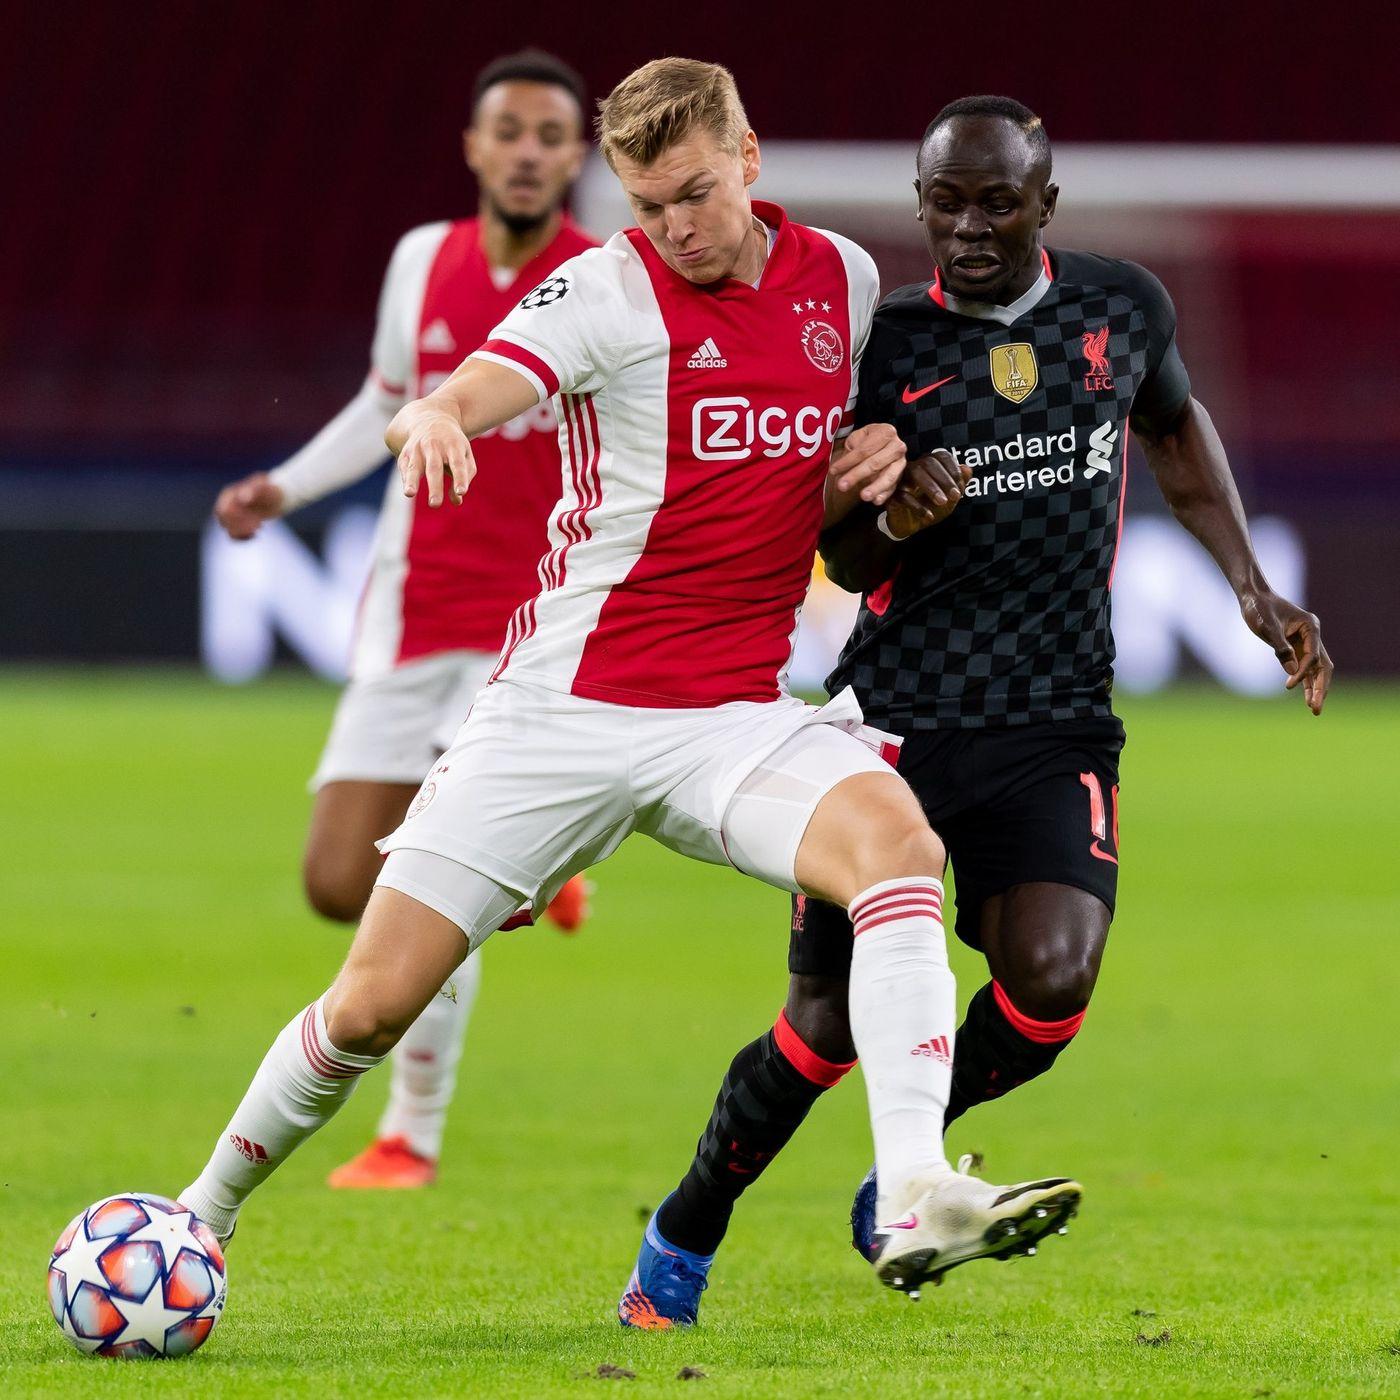 Under The Radar: Spotlight on potential Liverpool transfer target Perr Schuurs